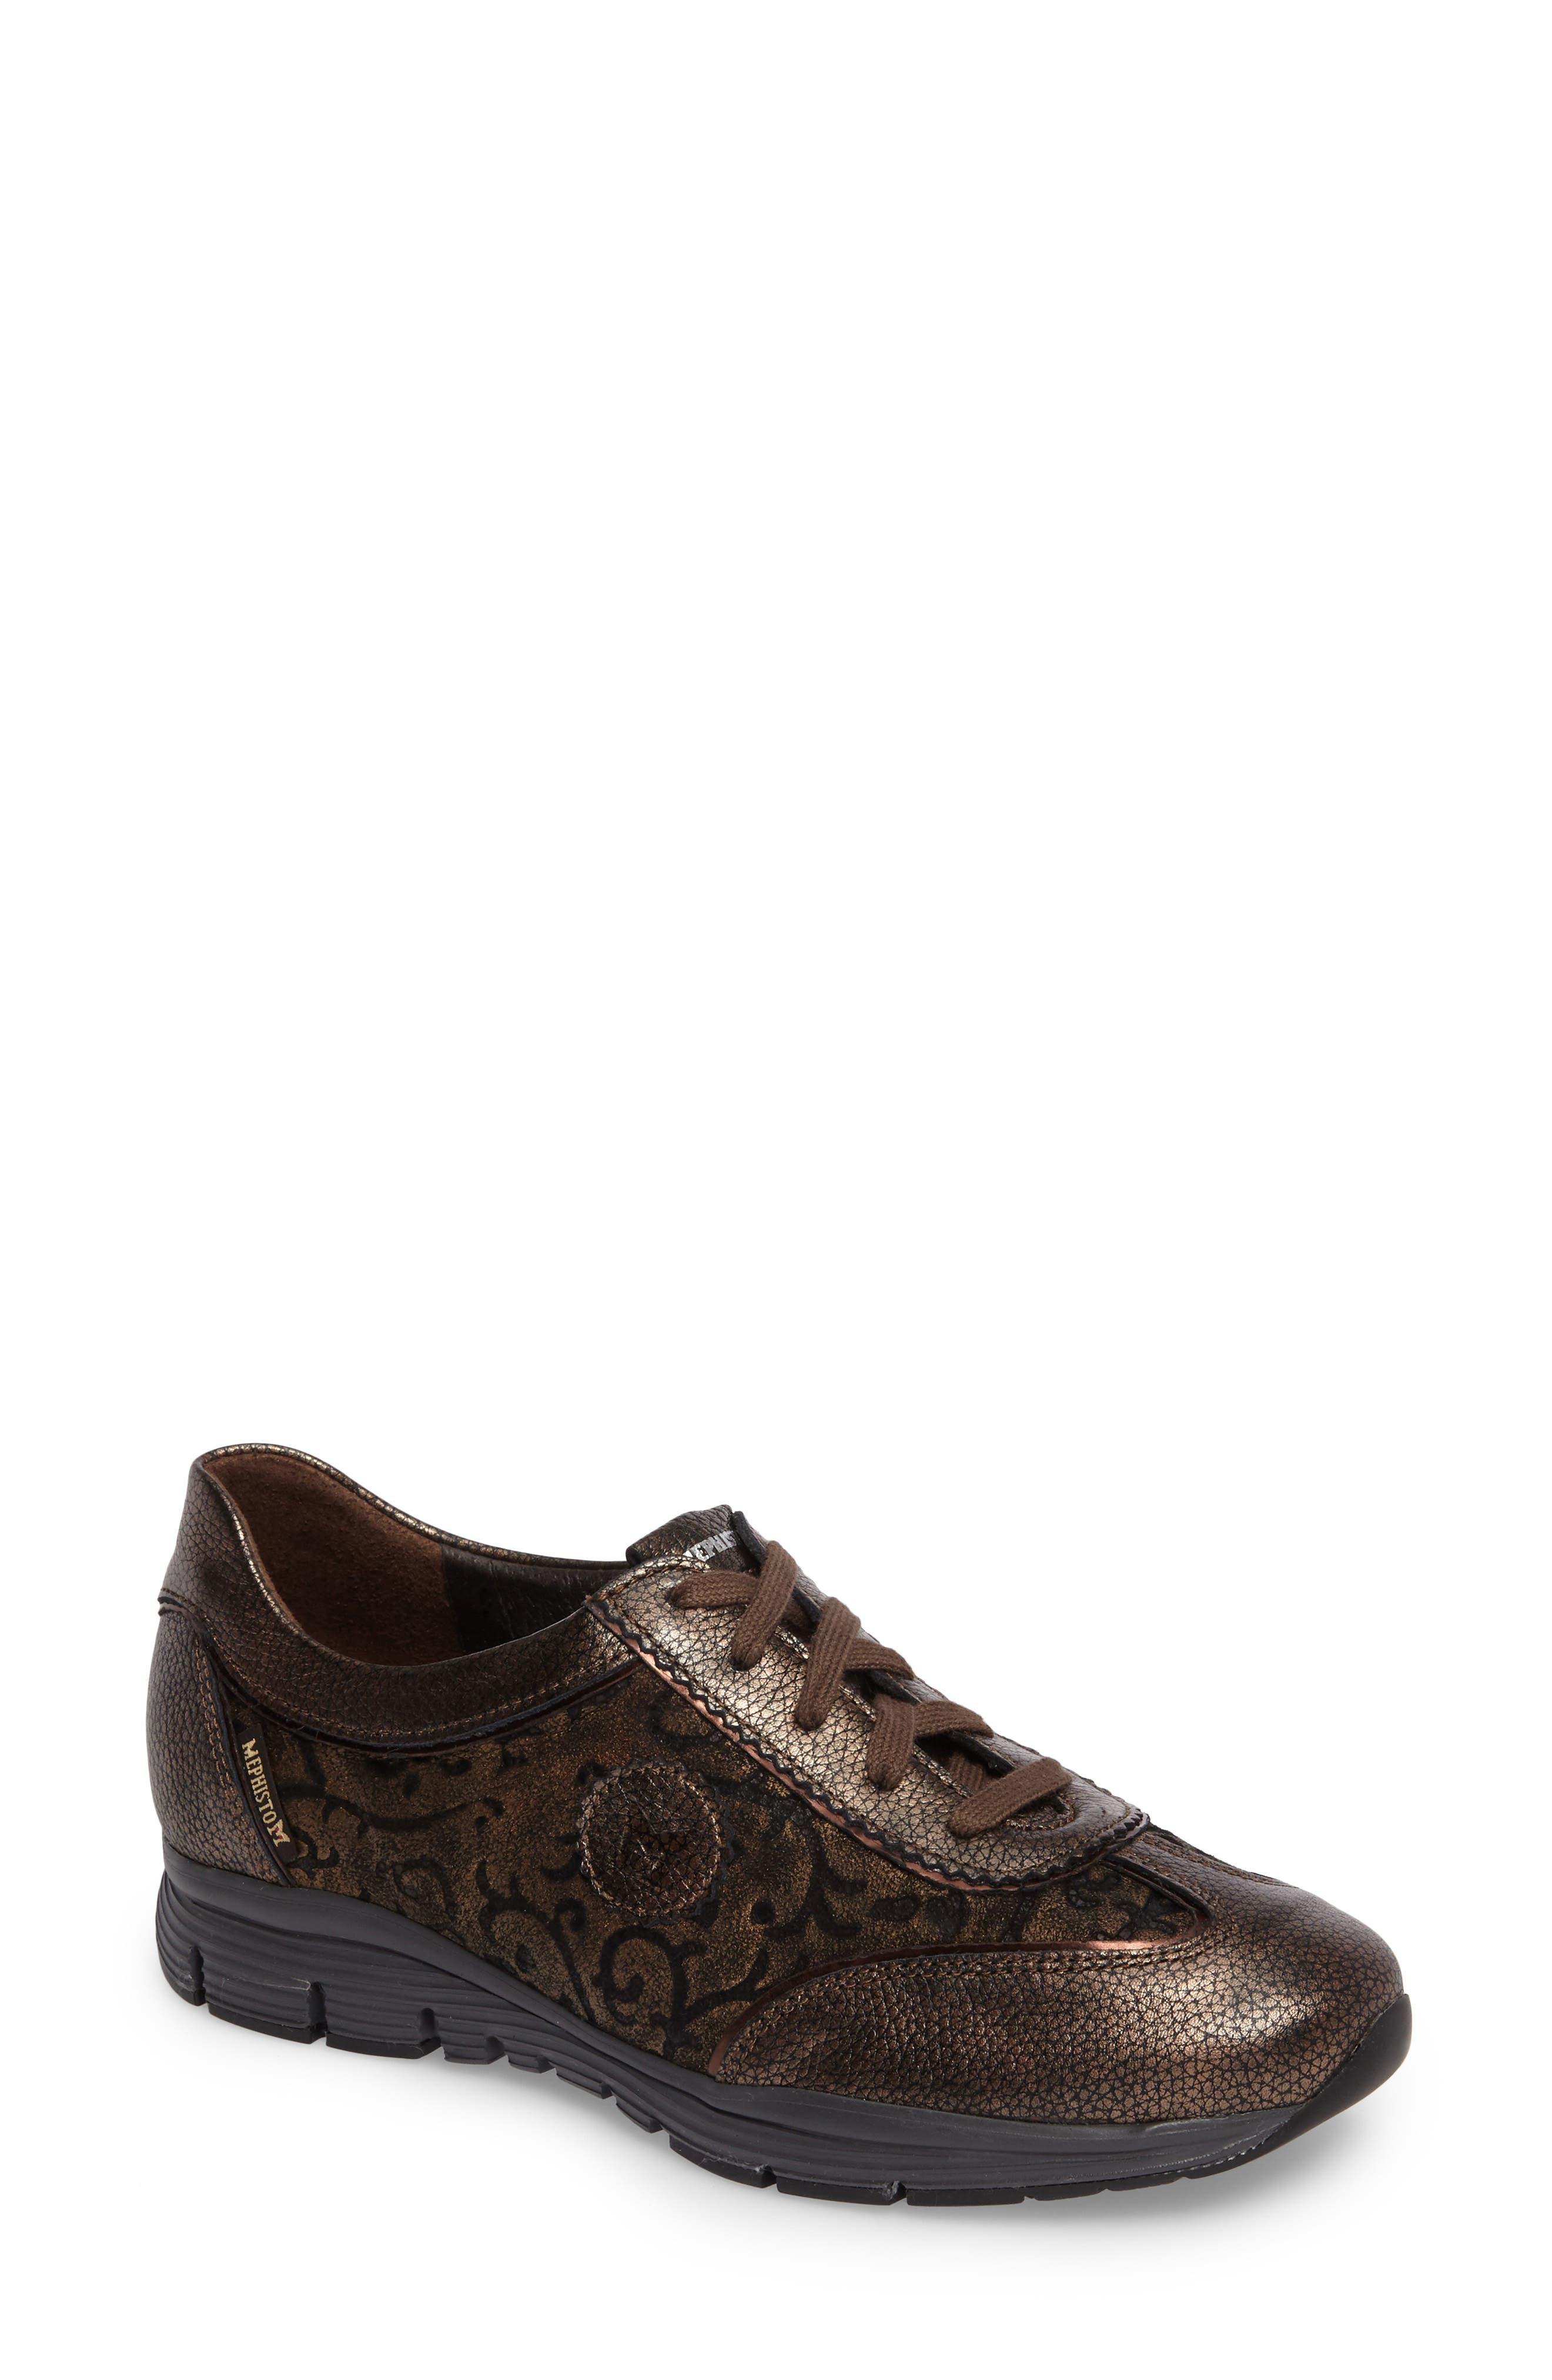 MEPHISTO 'Yael' Soft-Air Sneaker, Main, color, COPPER LEATHER